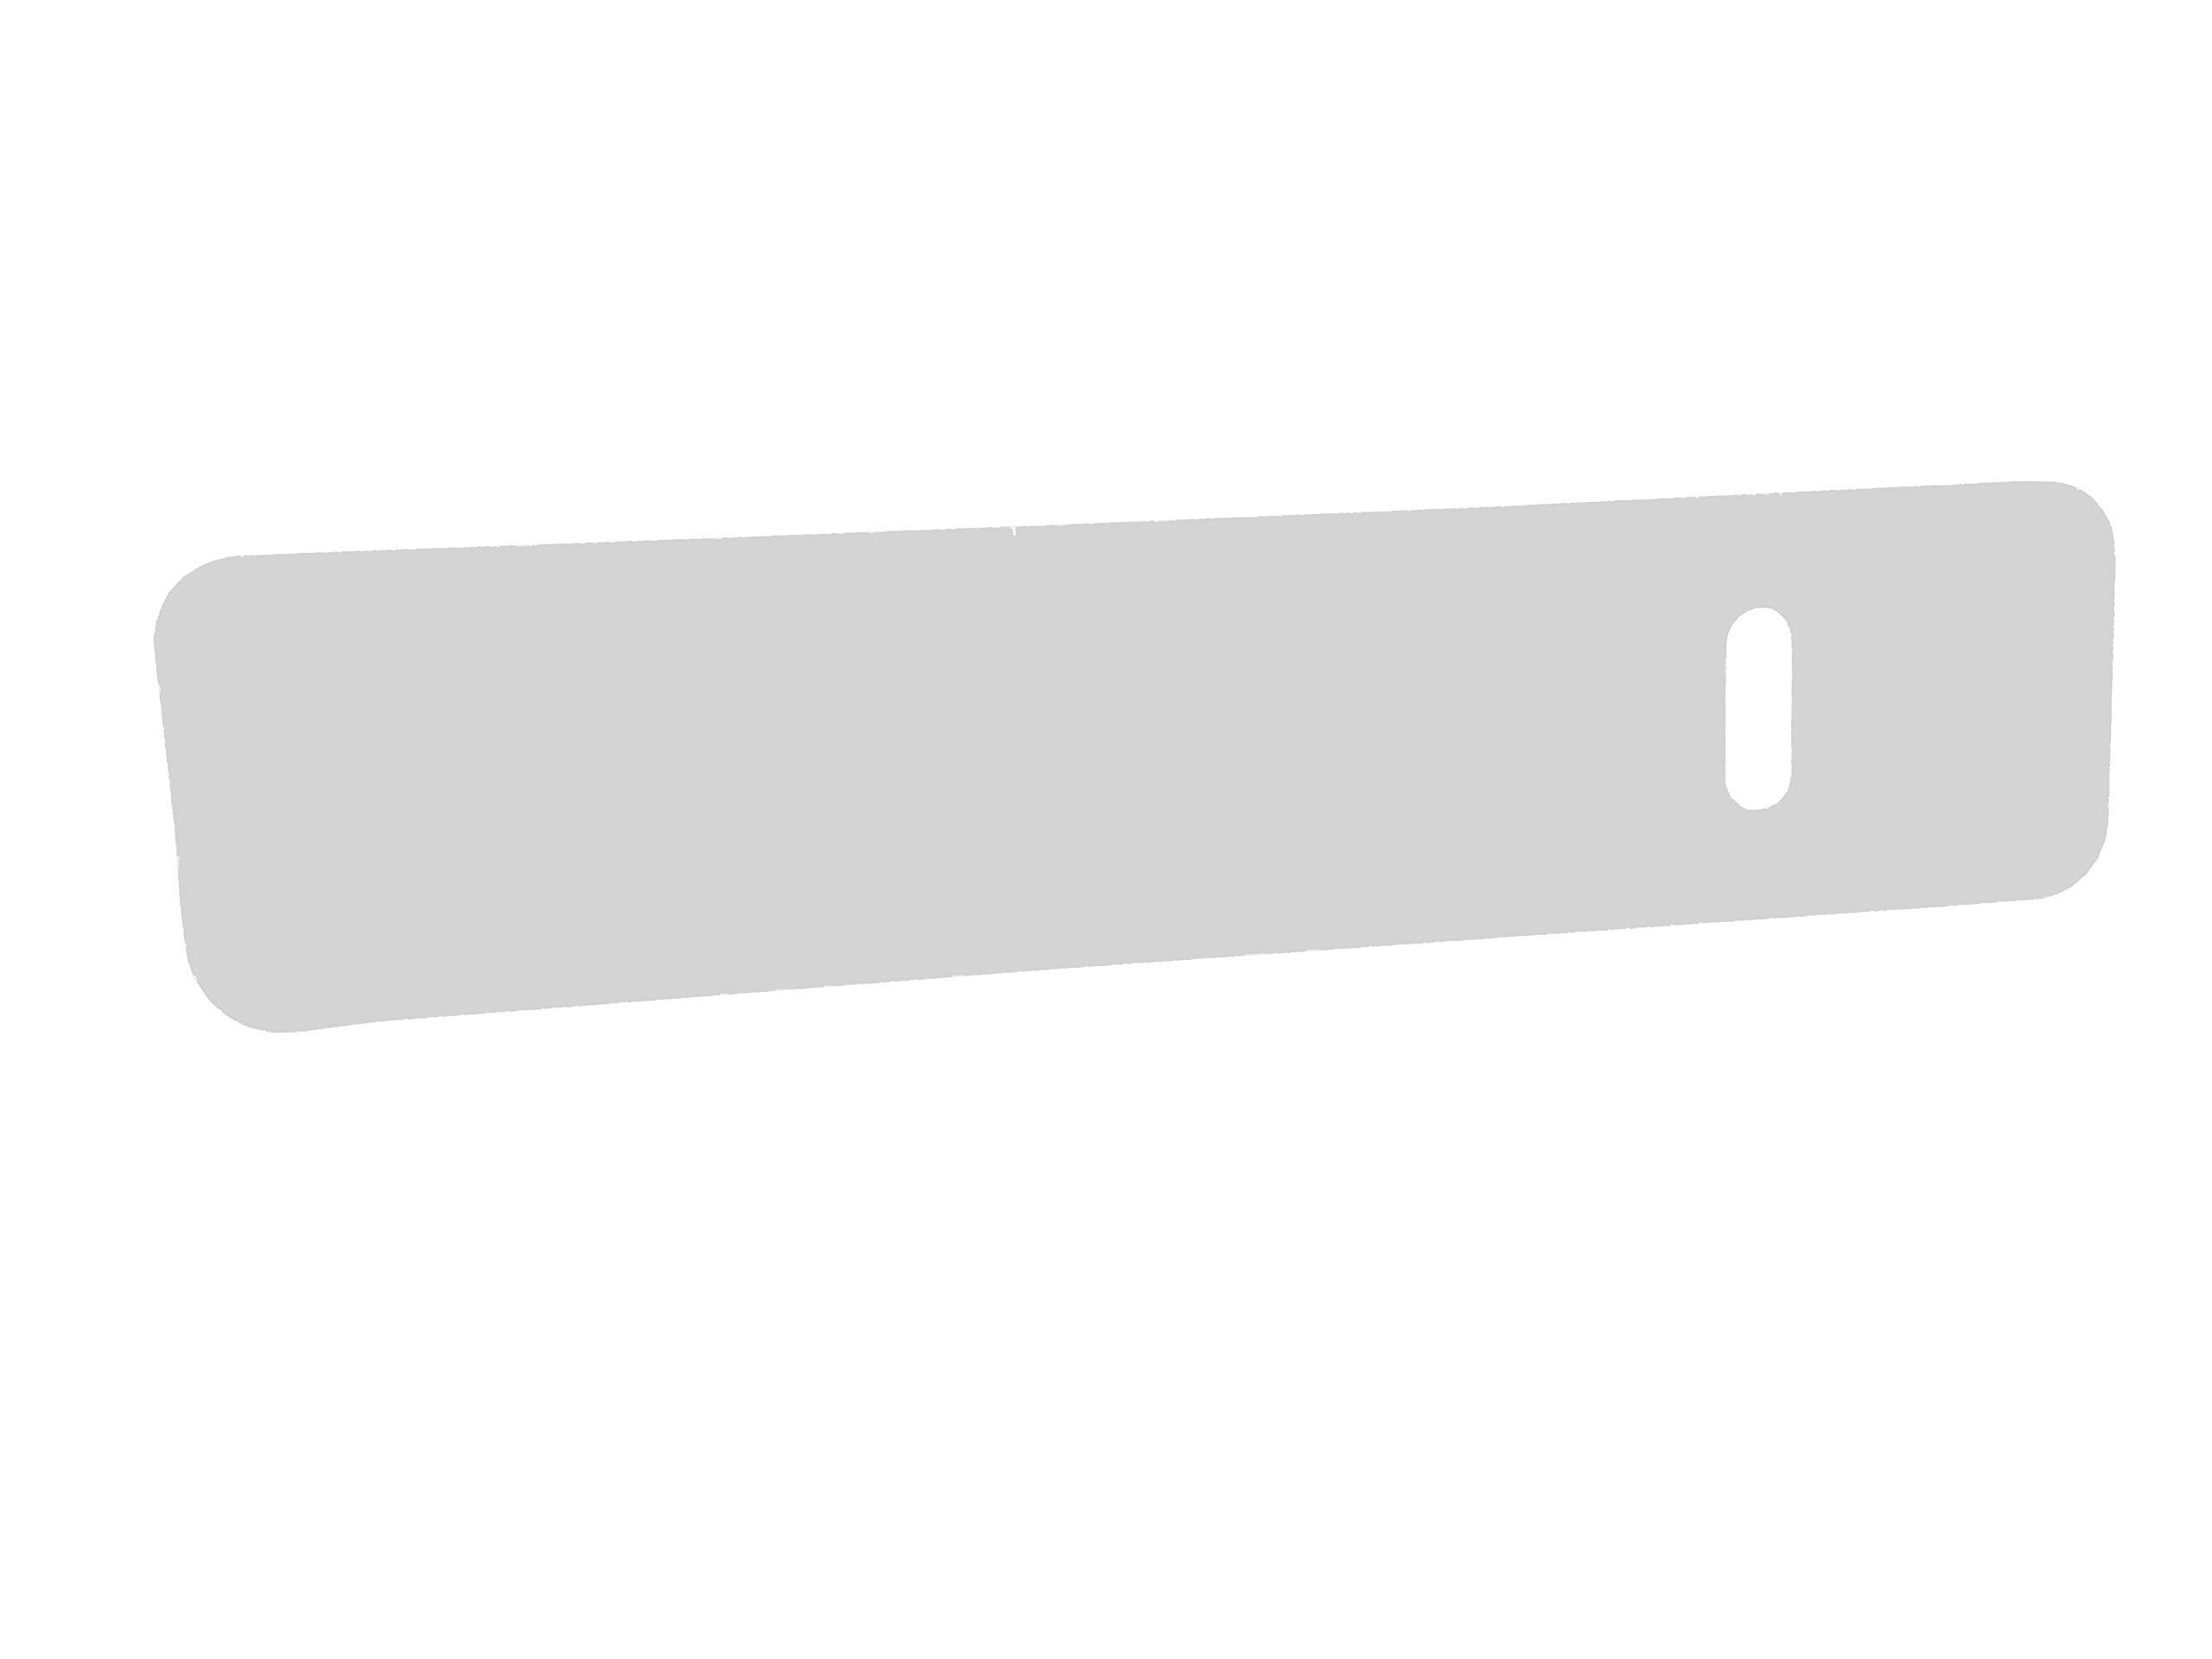 35 Inch Plastic Transfer Board with Hand Hole by Rehabilitation Advantage